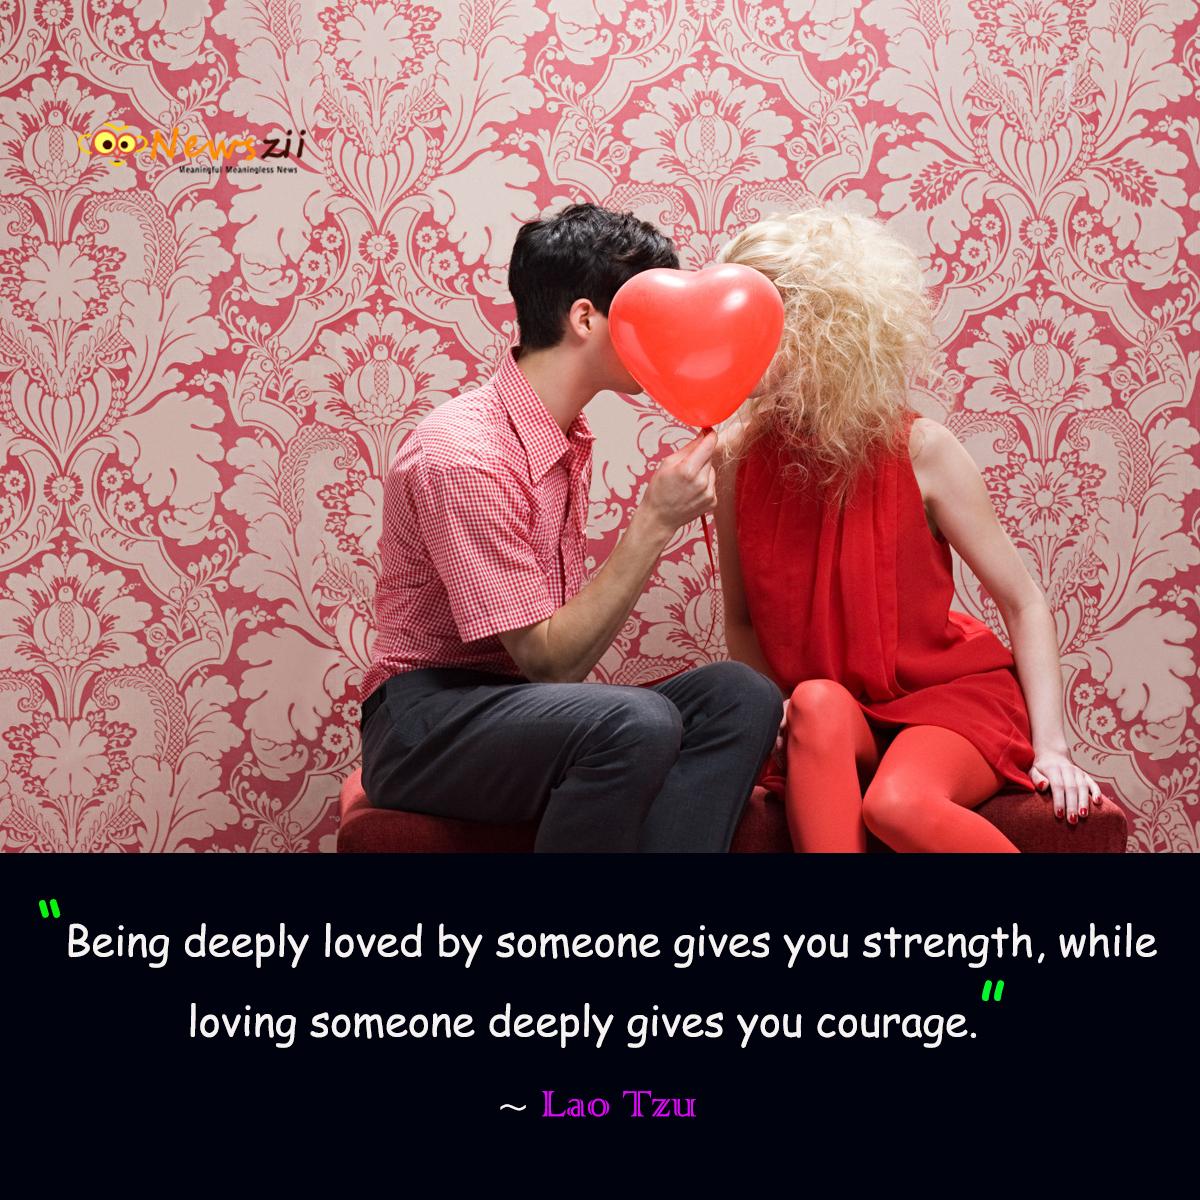 valentines-day-romantic-love-quotes-v101